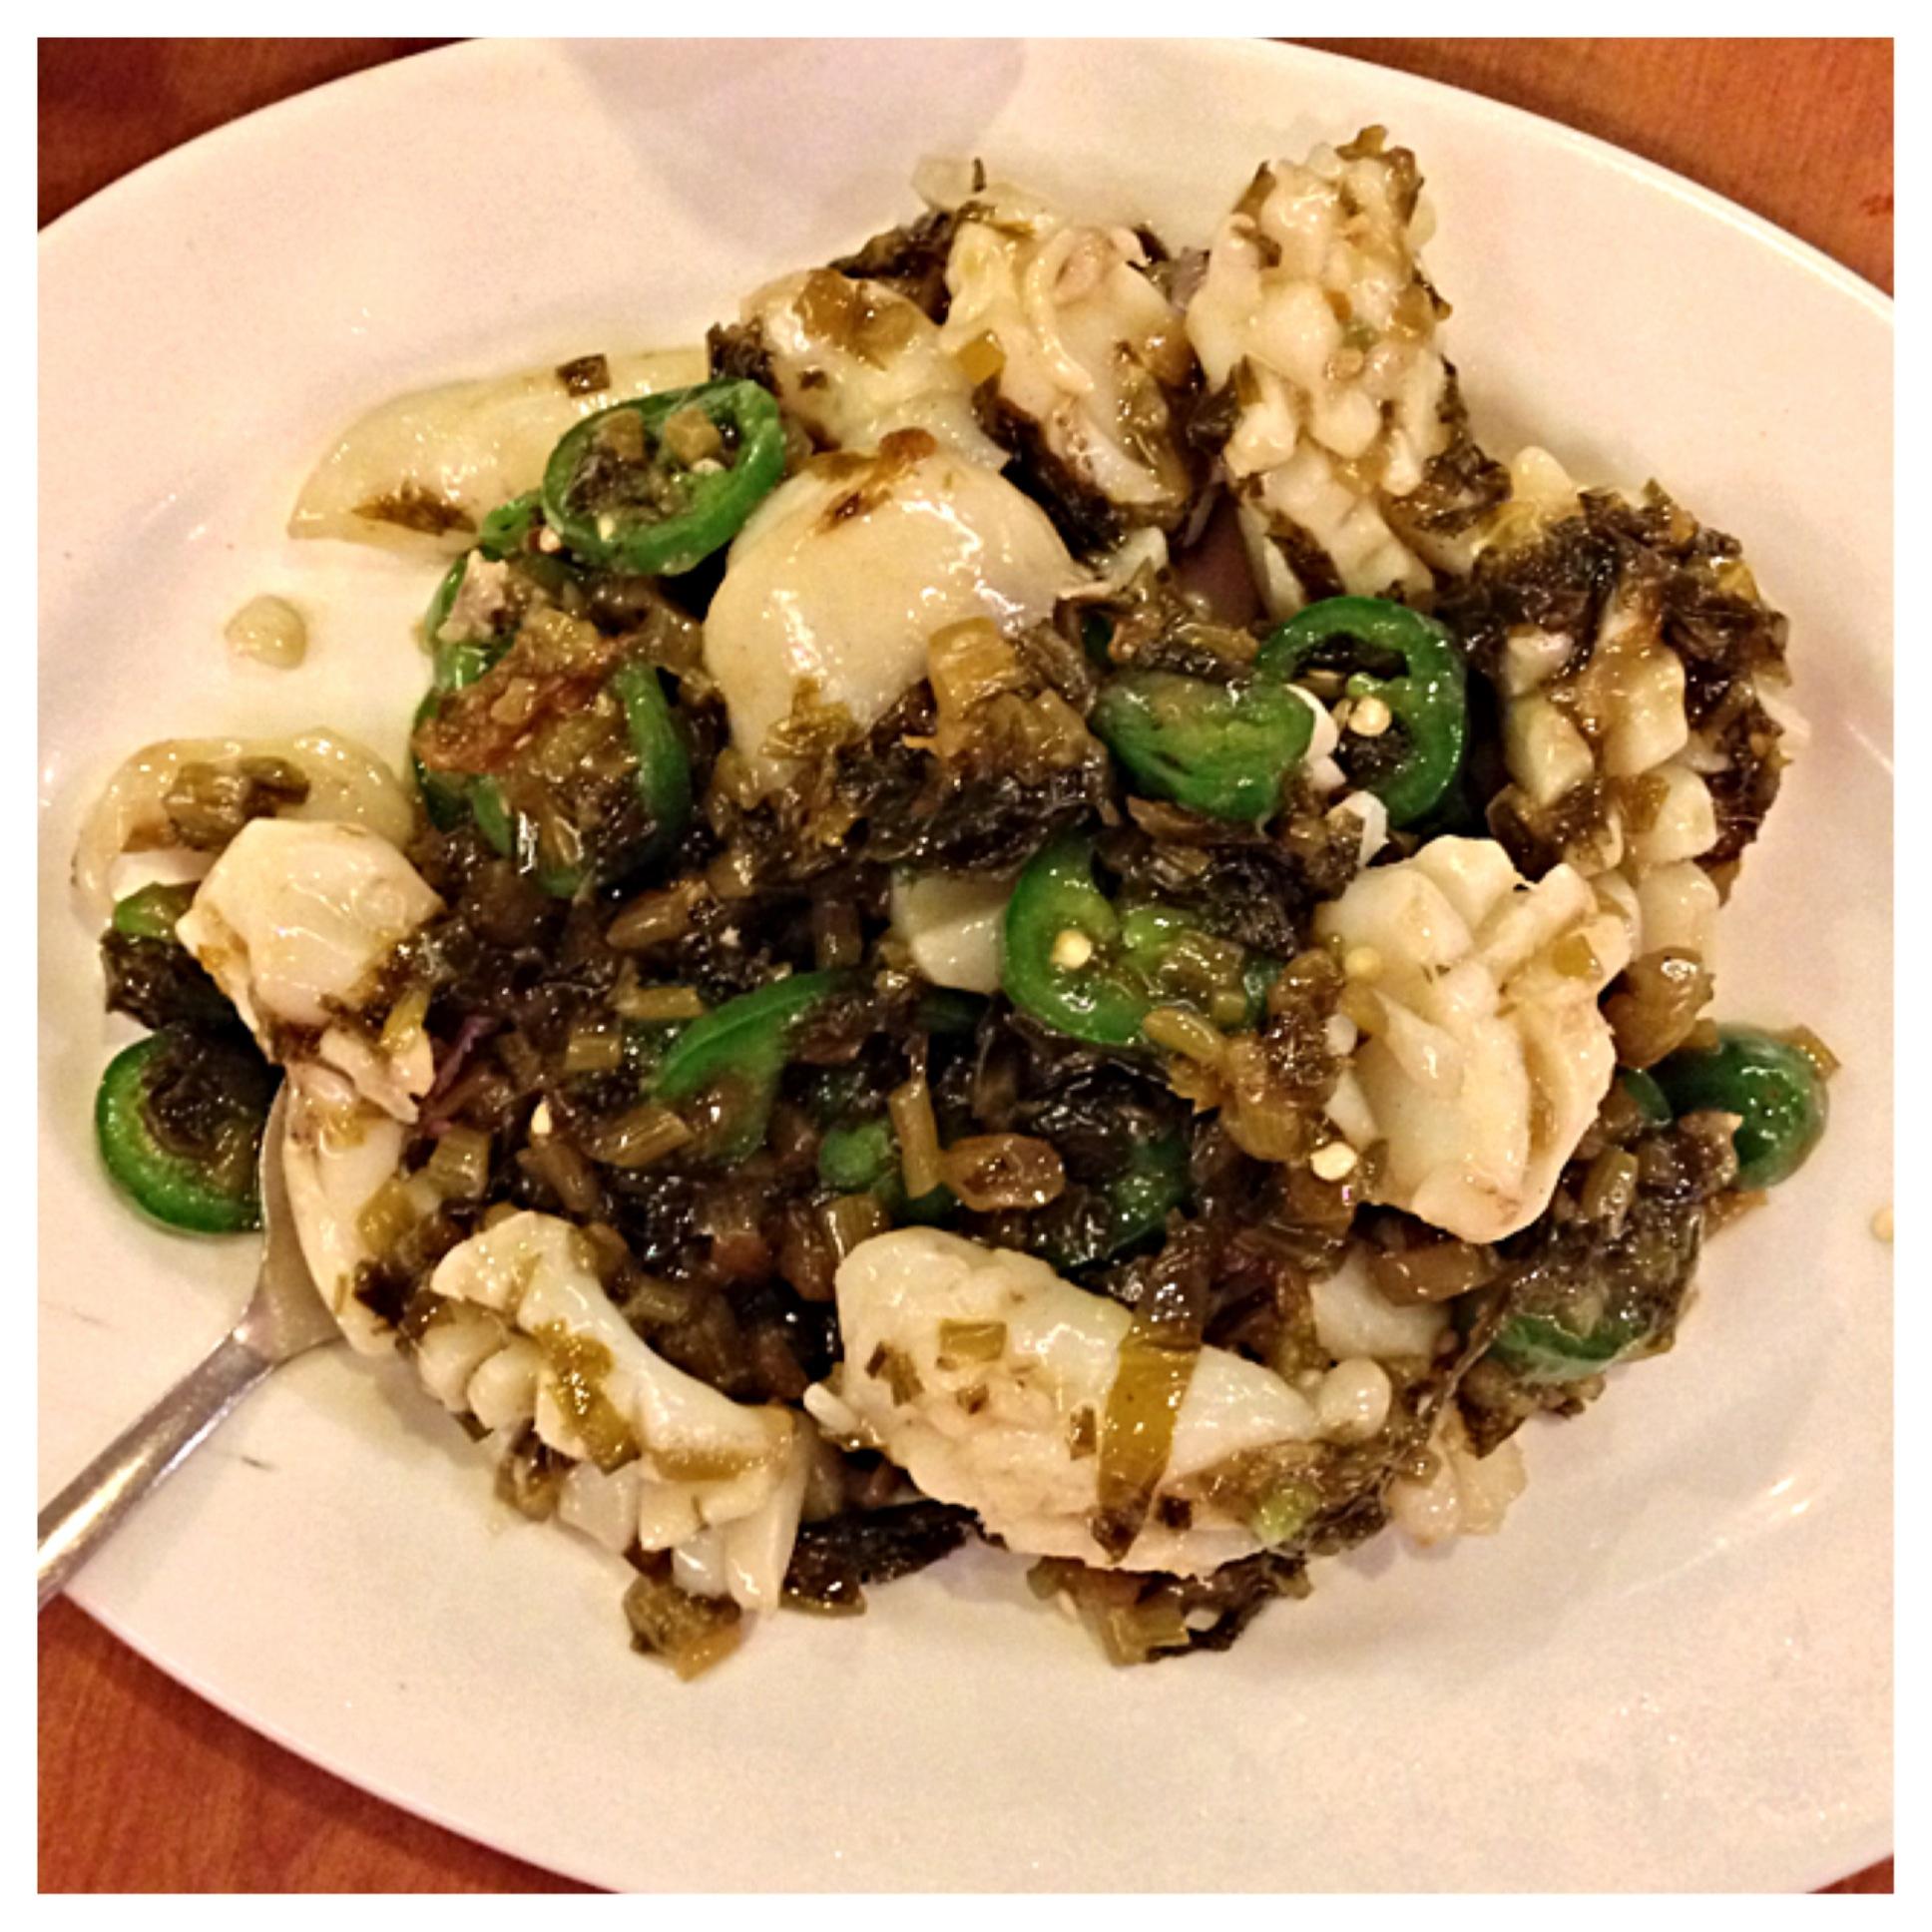 Soup Dumpling Joes Shanghai Languageen: Joe's Shanghai